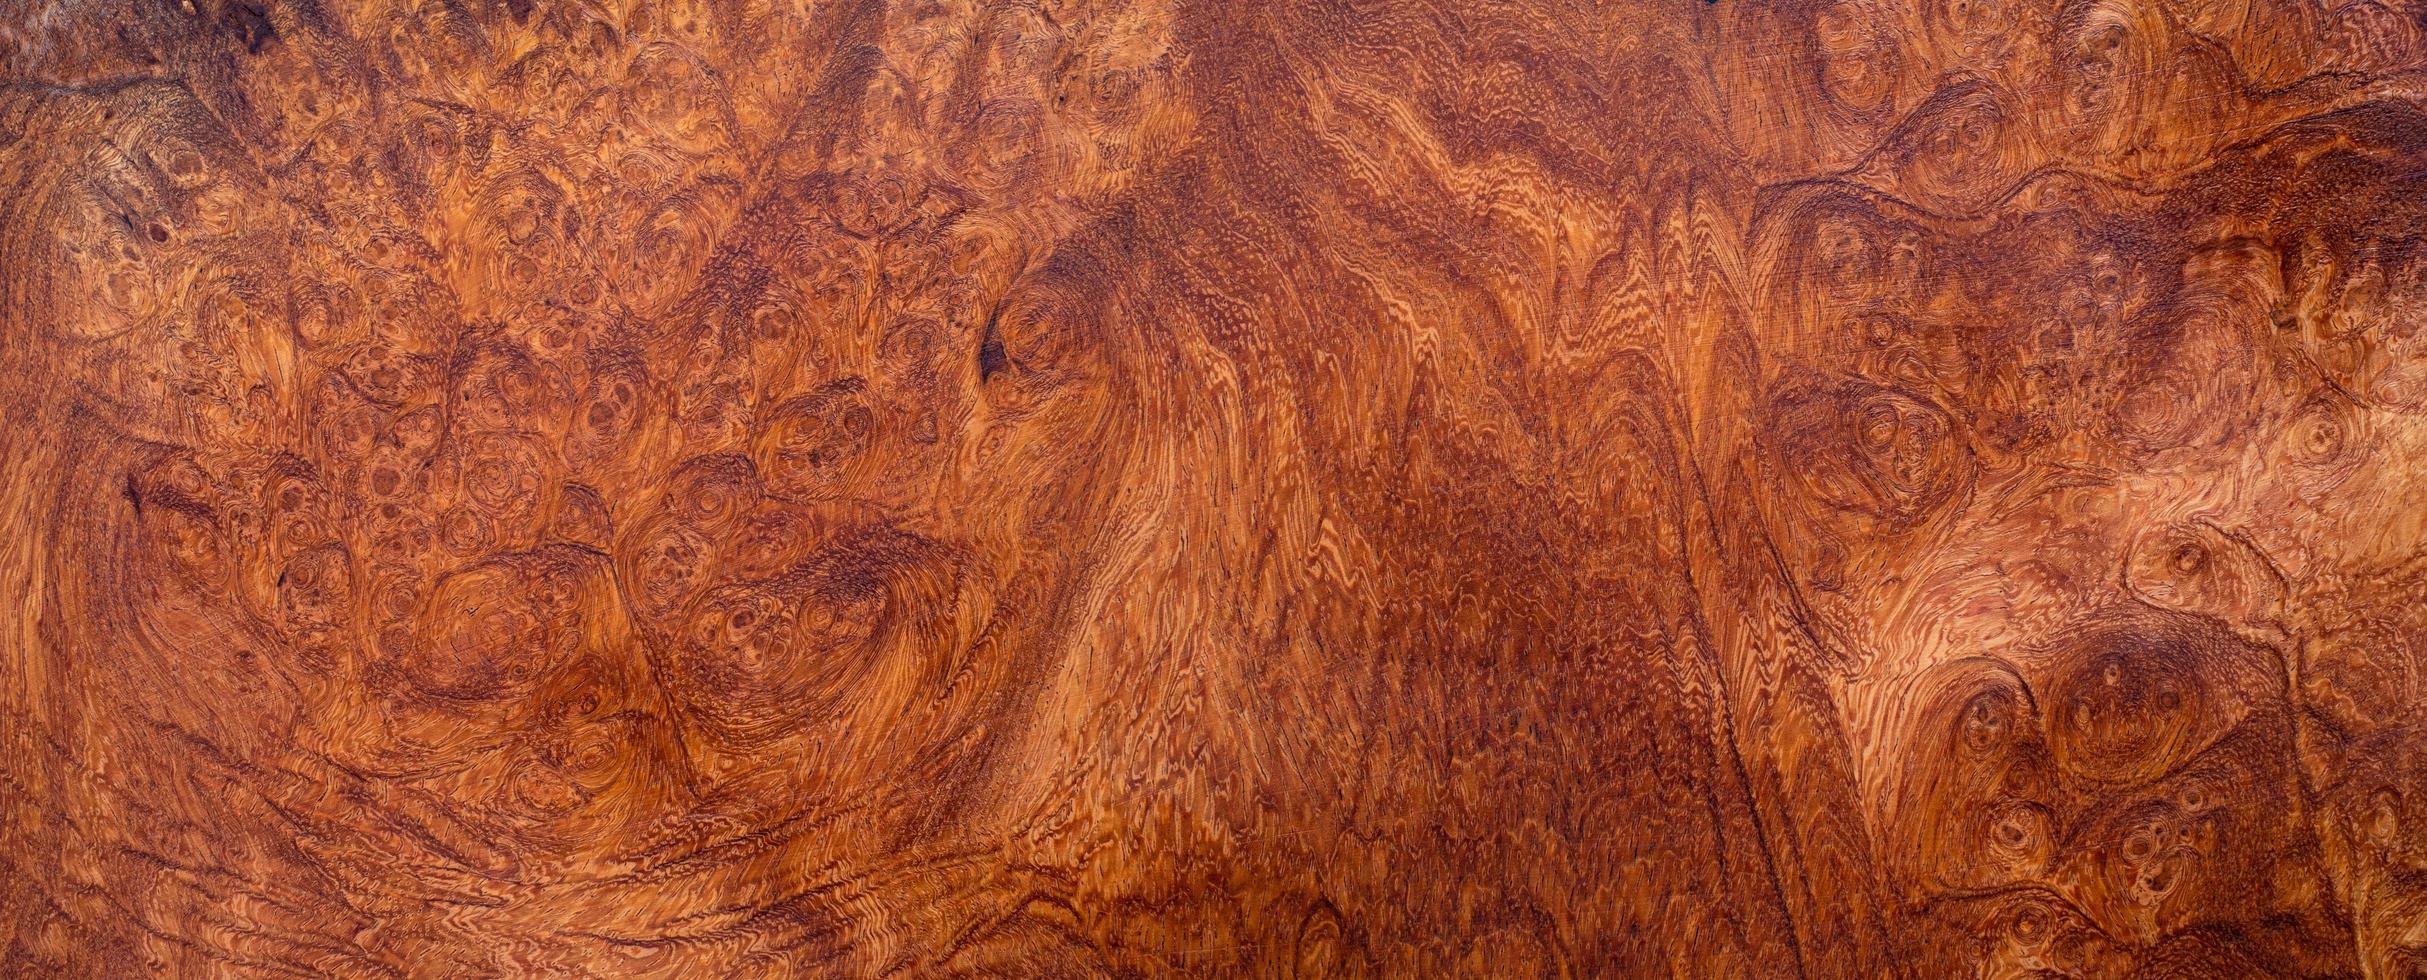 Natural burl wood texture background photo